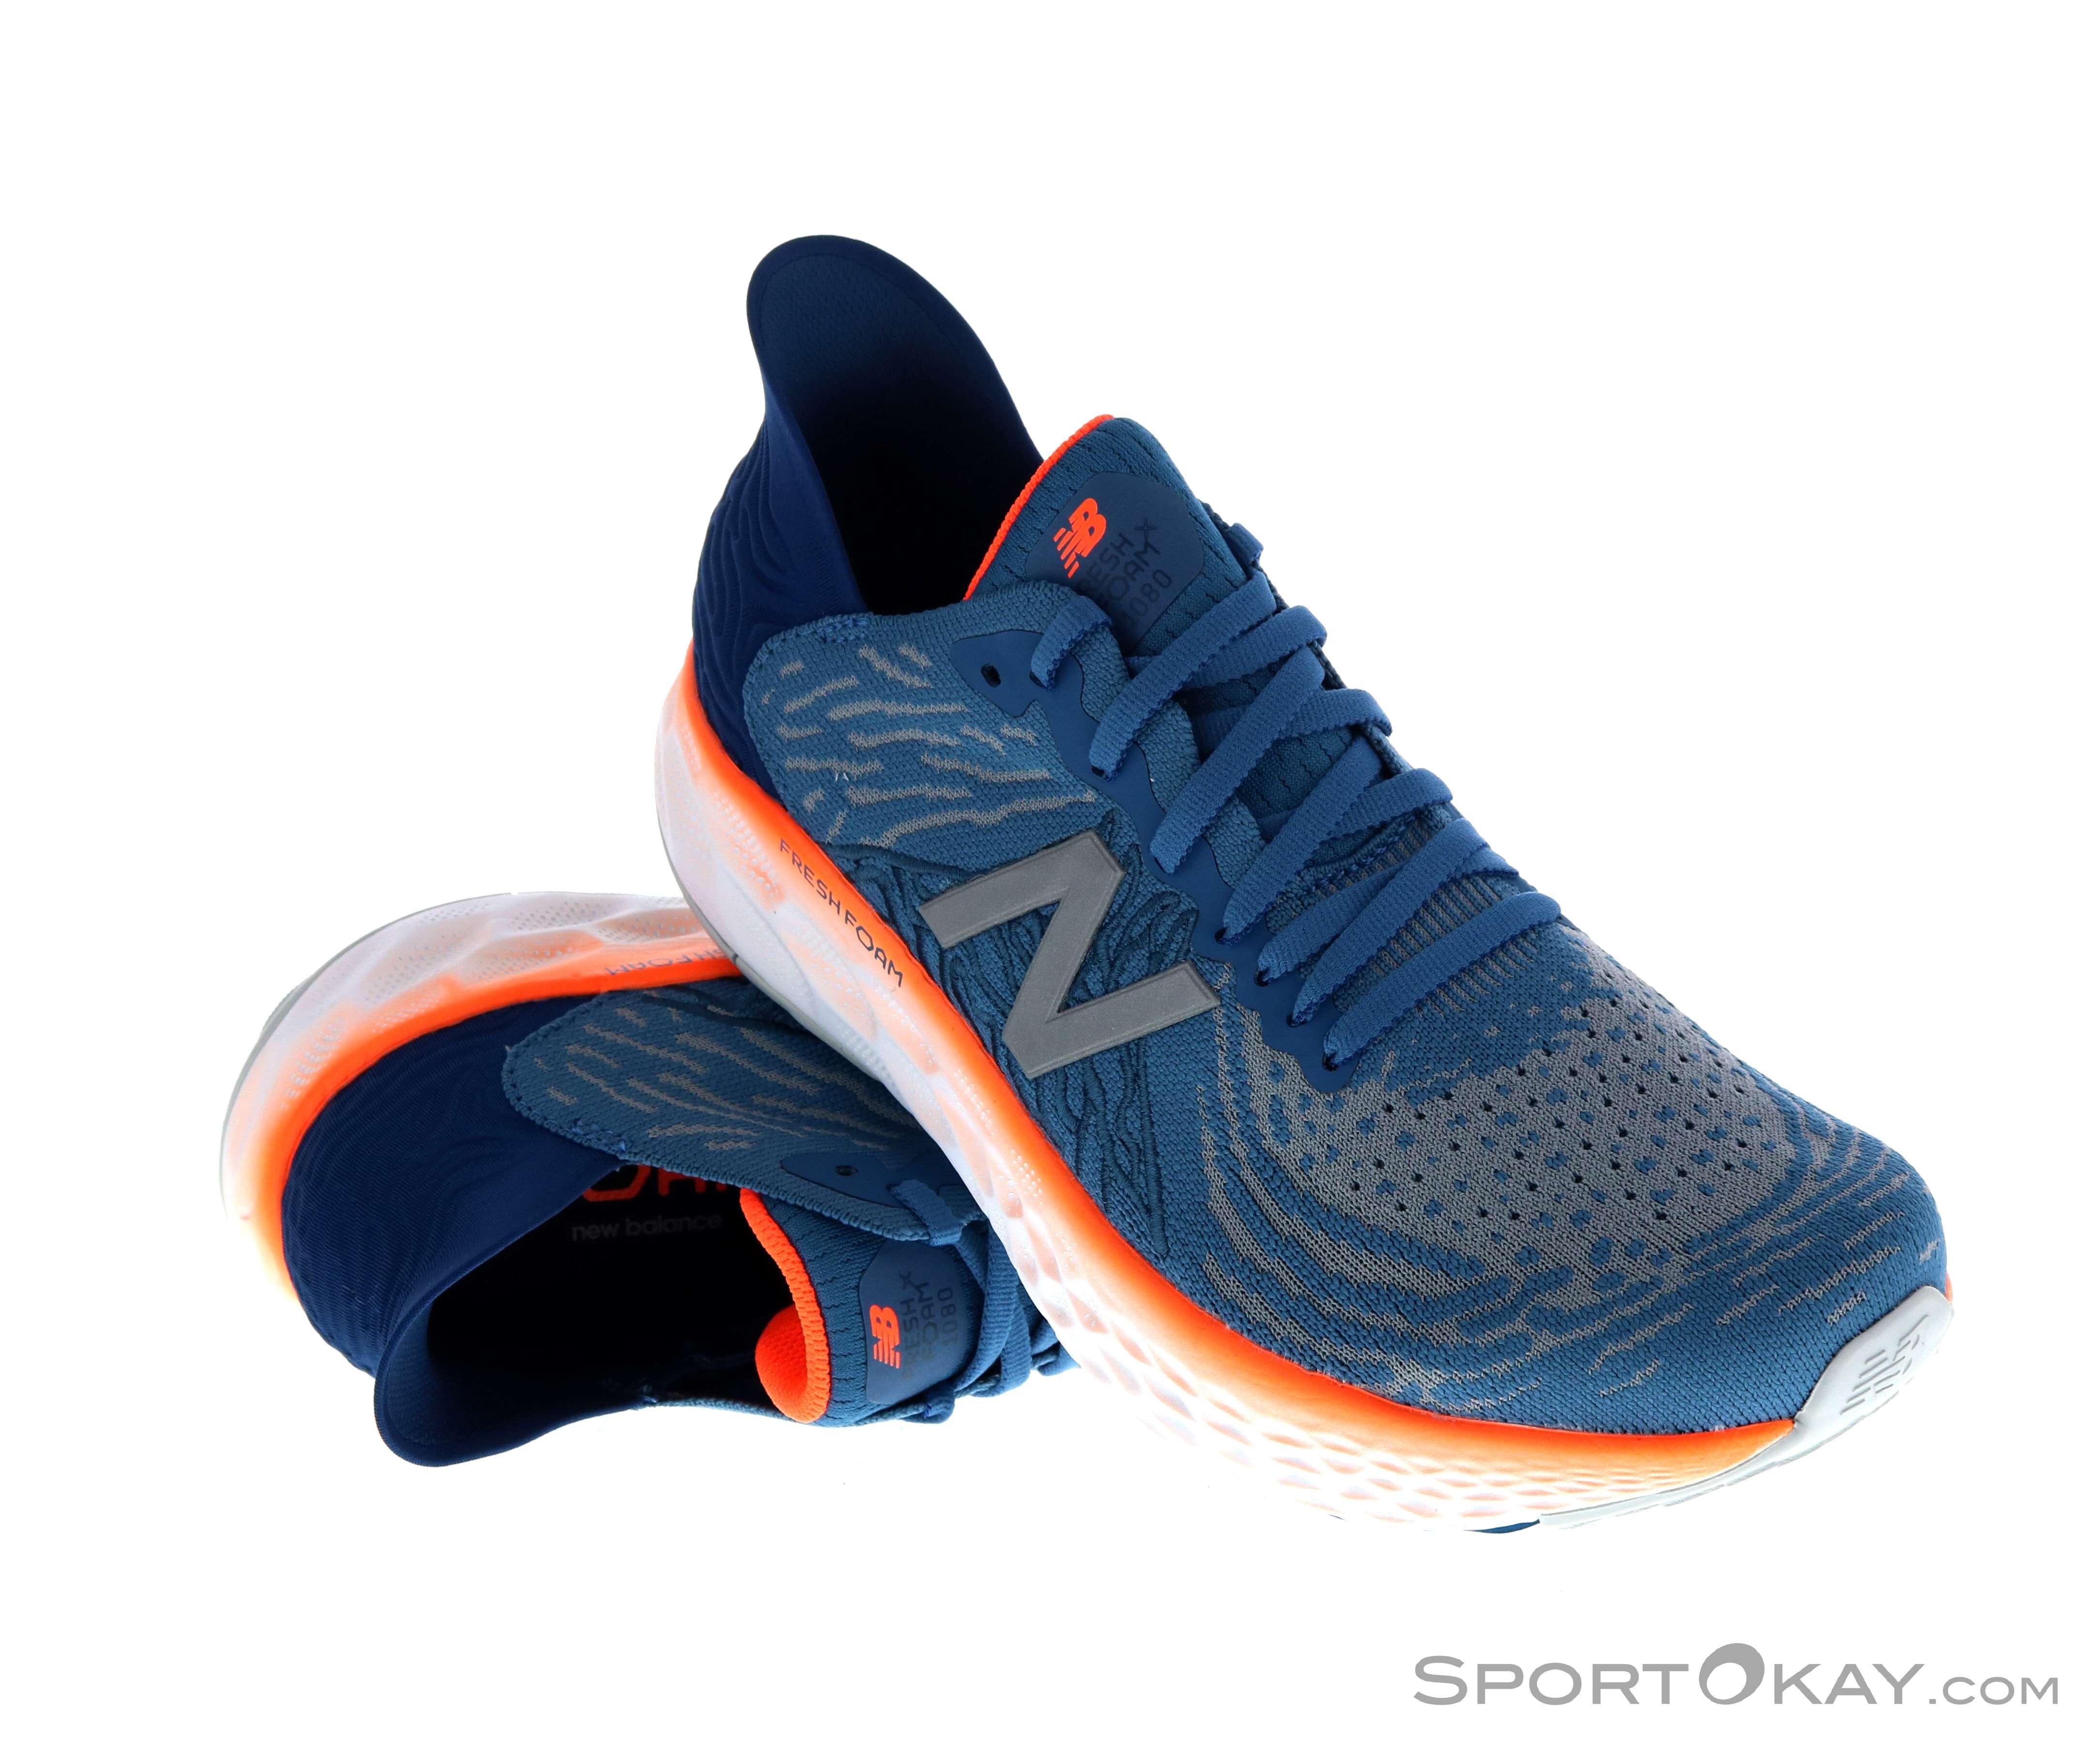 New Balance Fresh Foam 1080 V10 Mens Trail Running Shoes - Trail ...